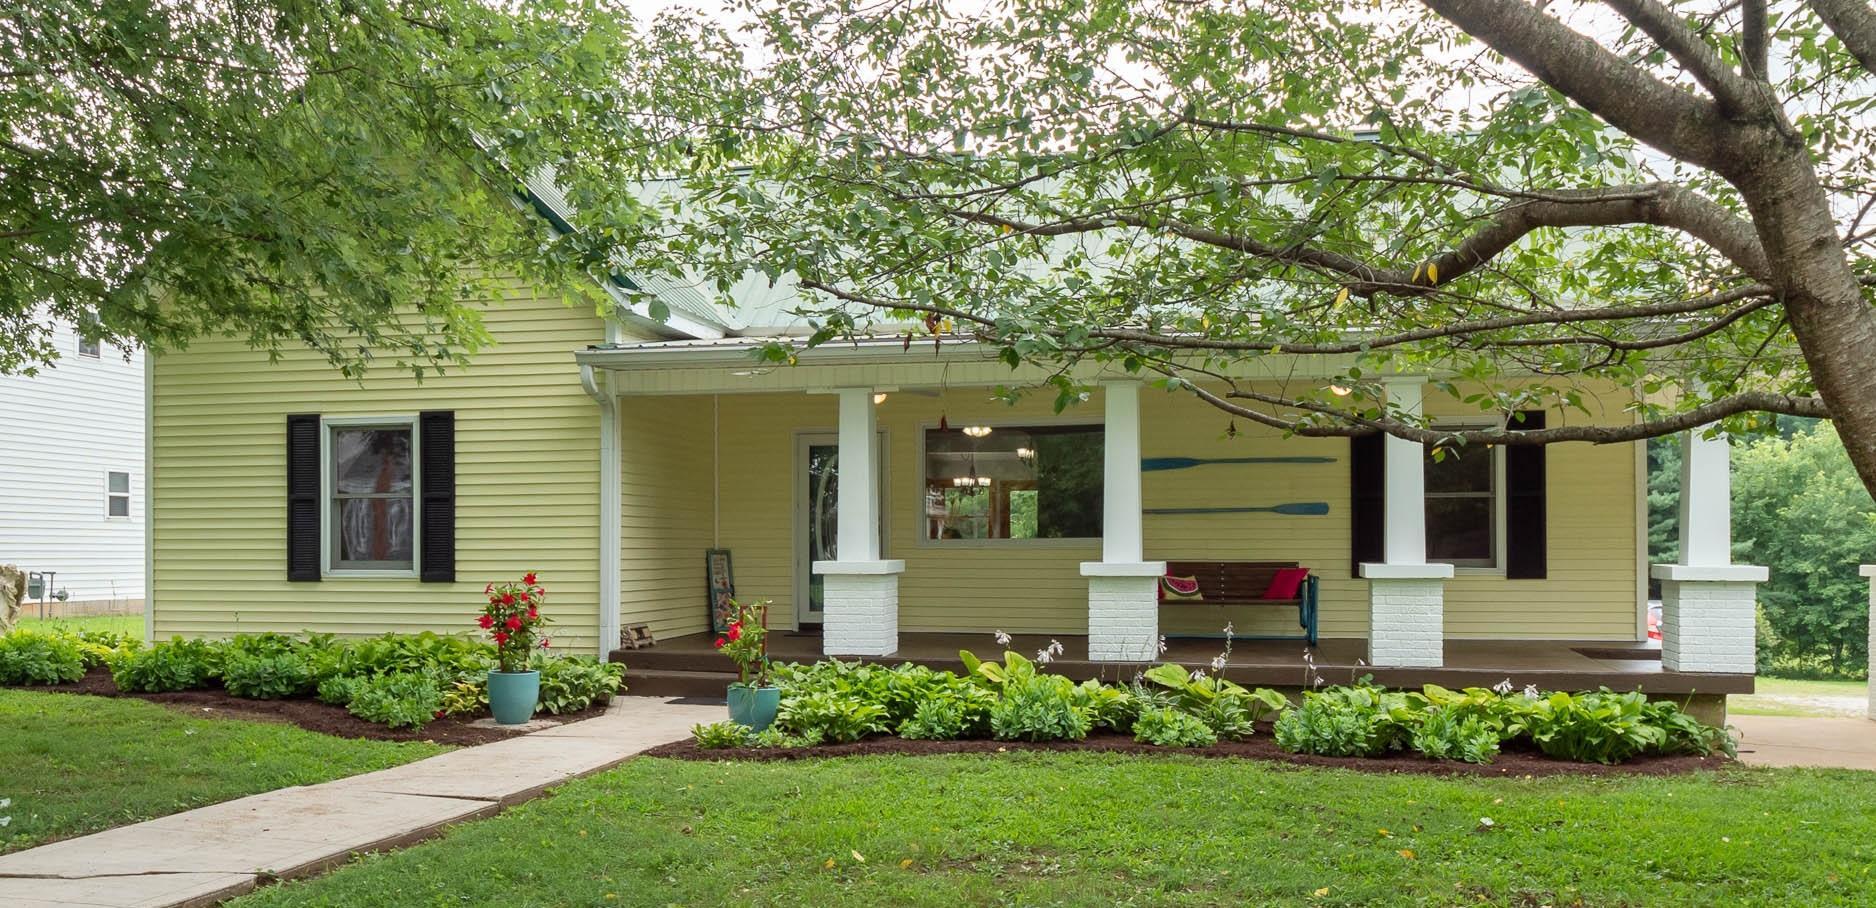 209 S Russell St, Portland, TN 37148 - Portland, TN real estate listing